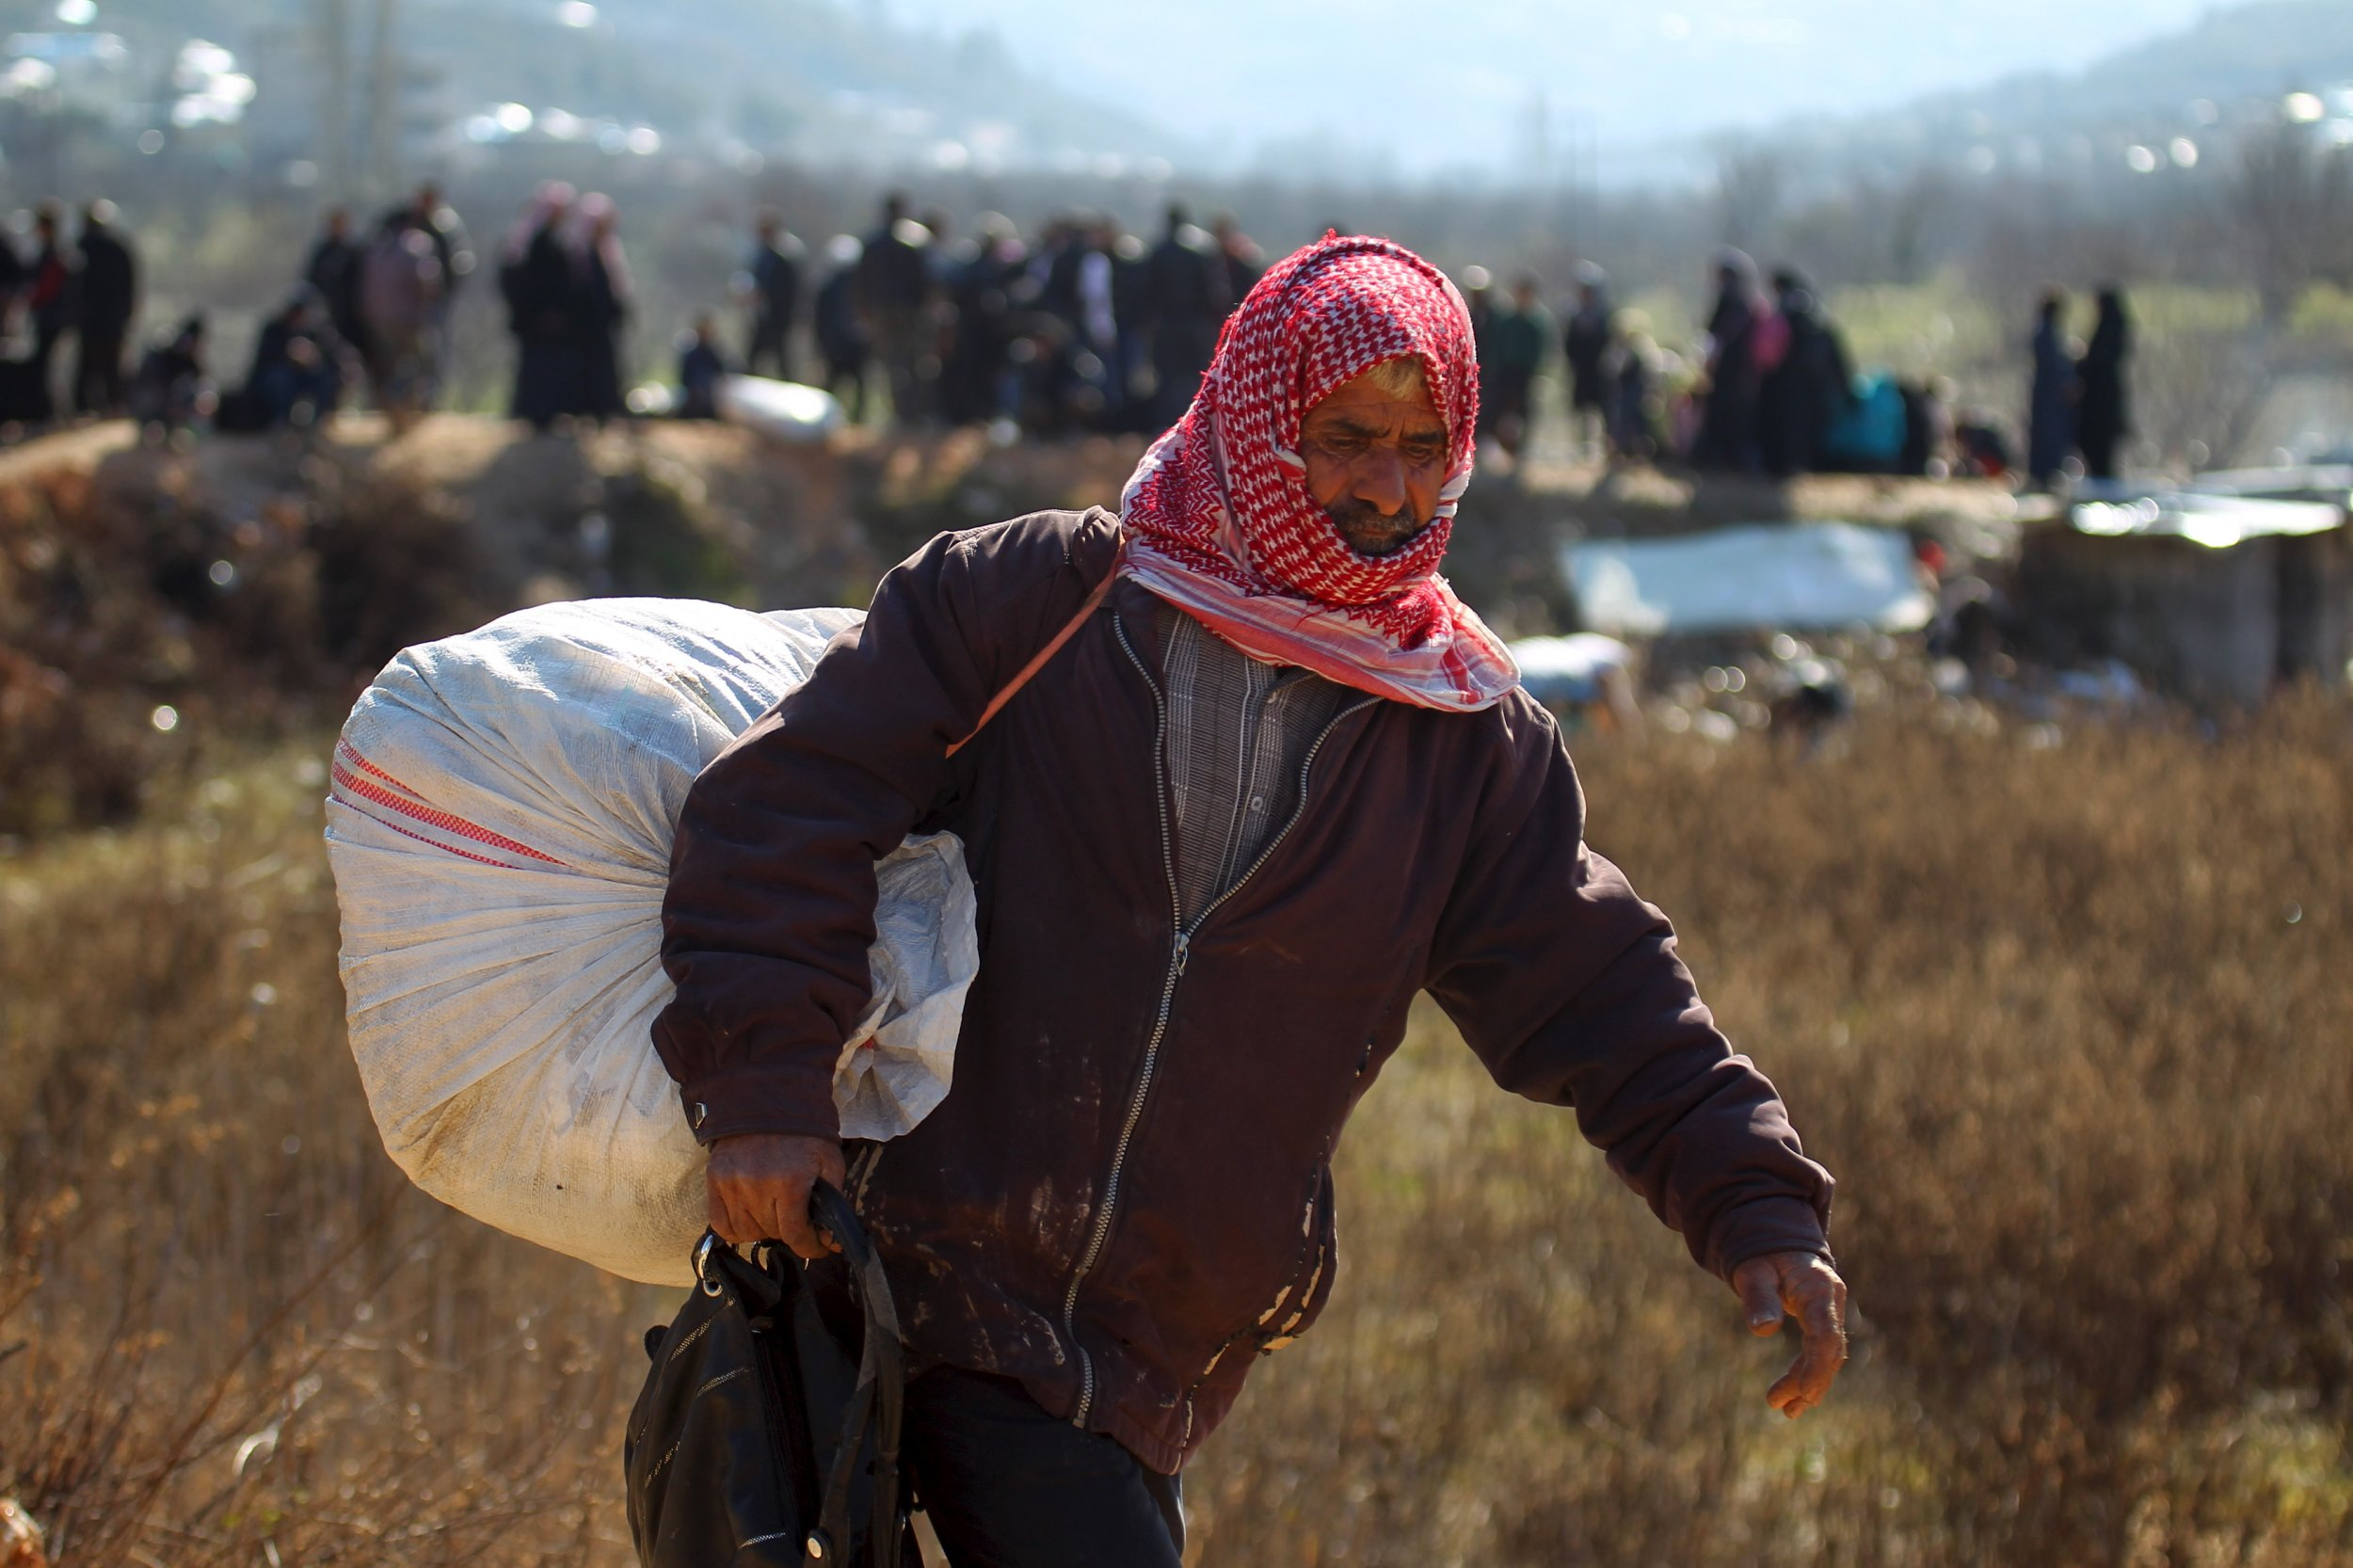 02/02/2016_Syria Refugee